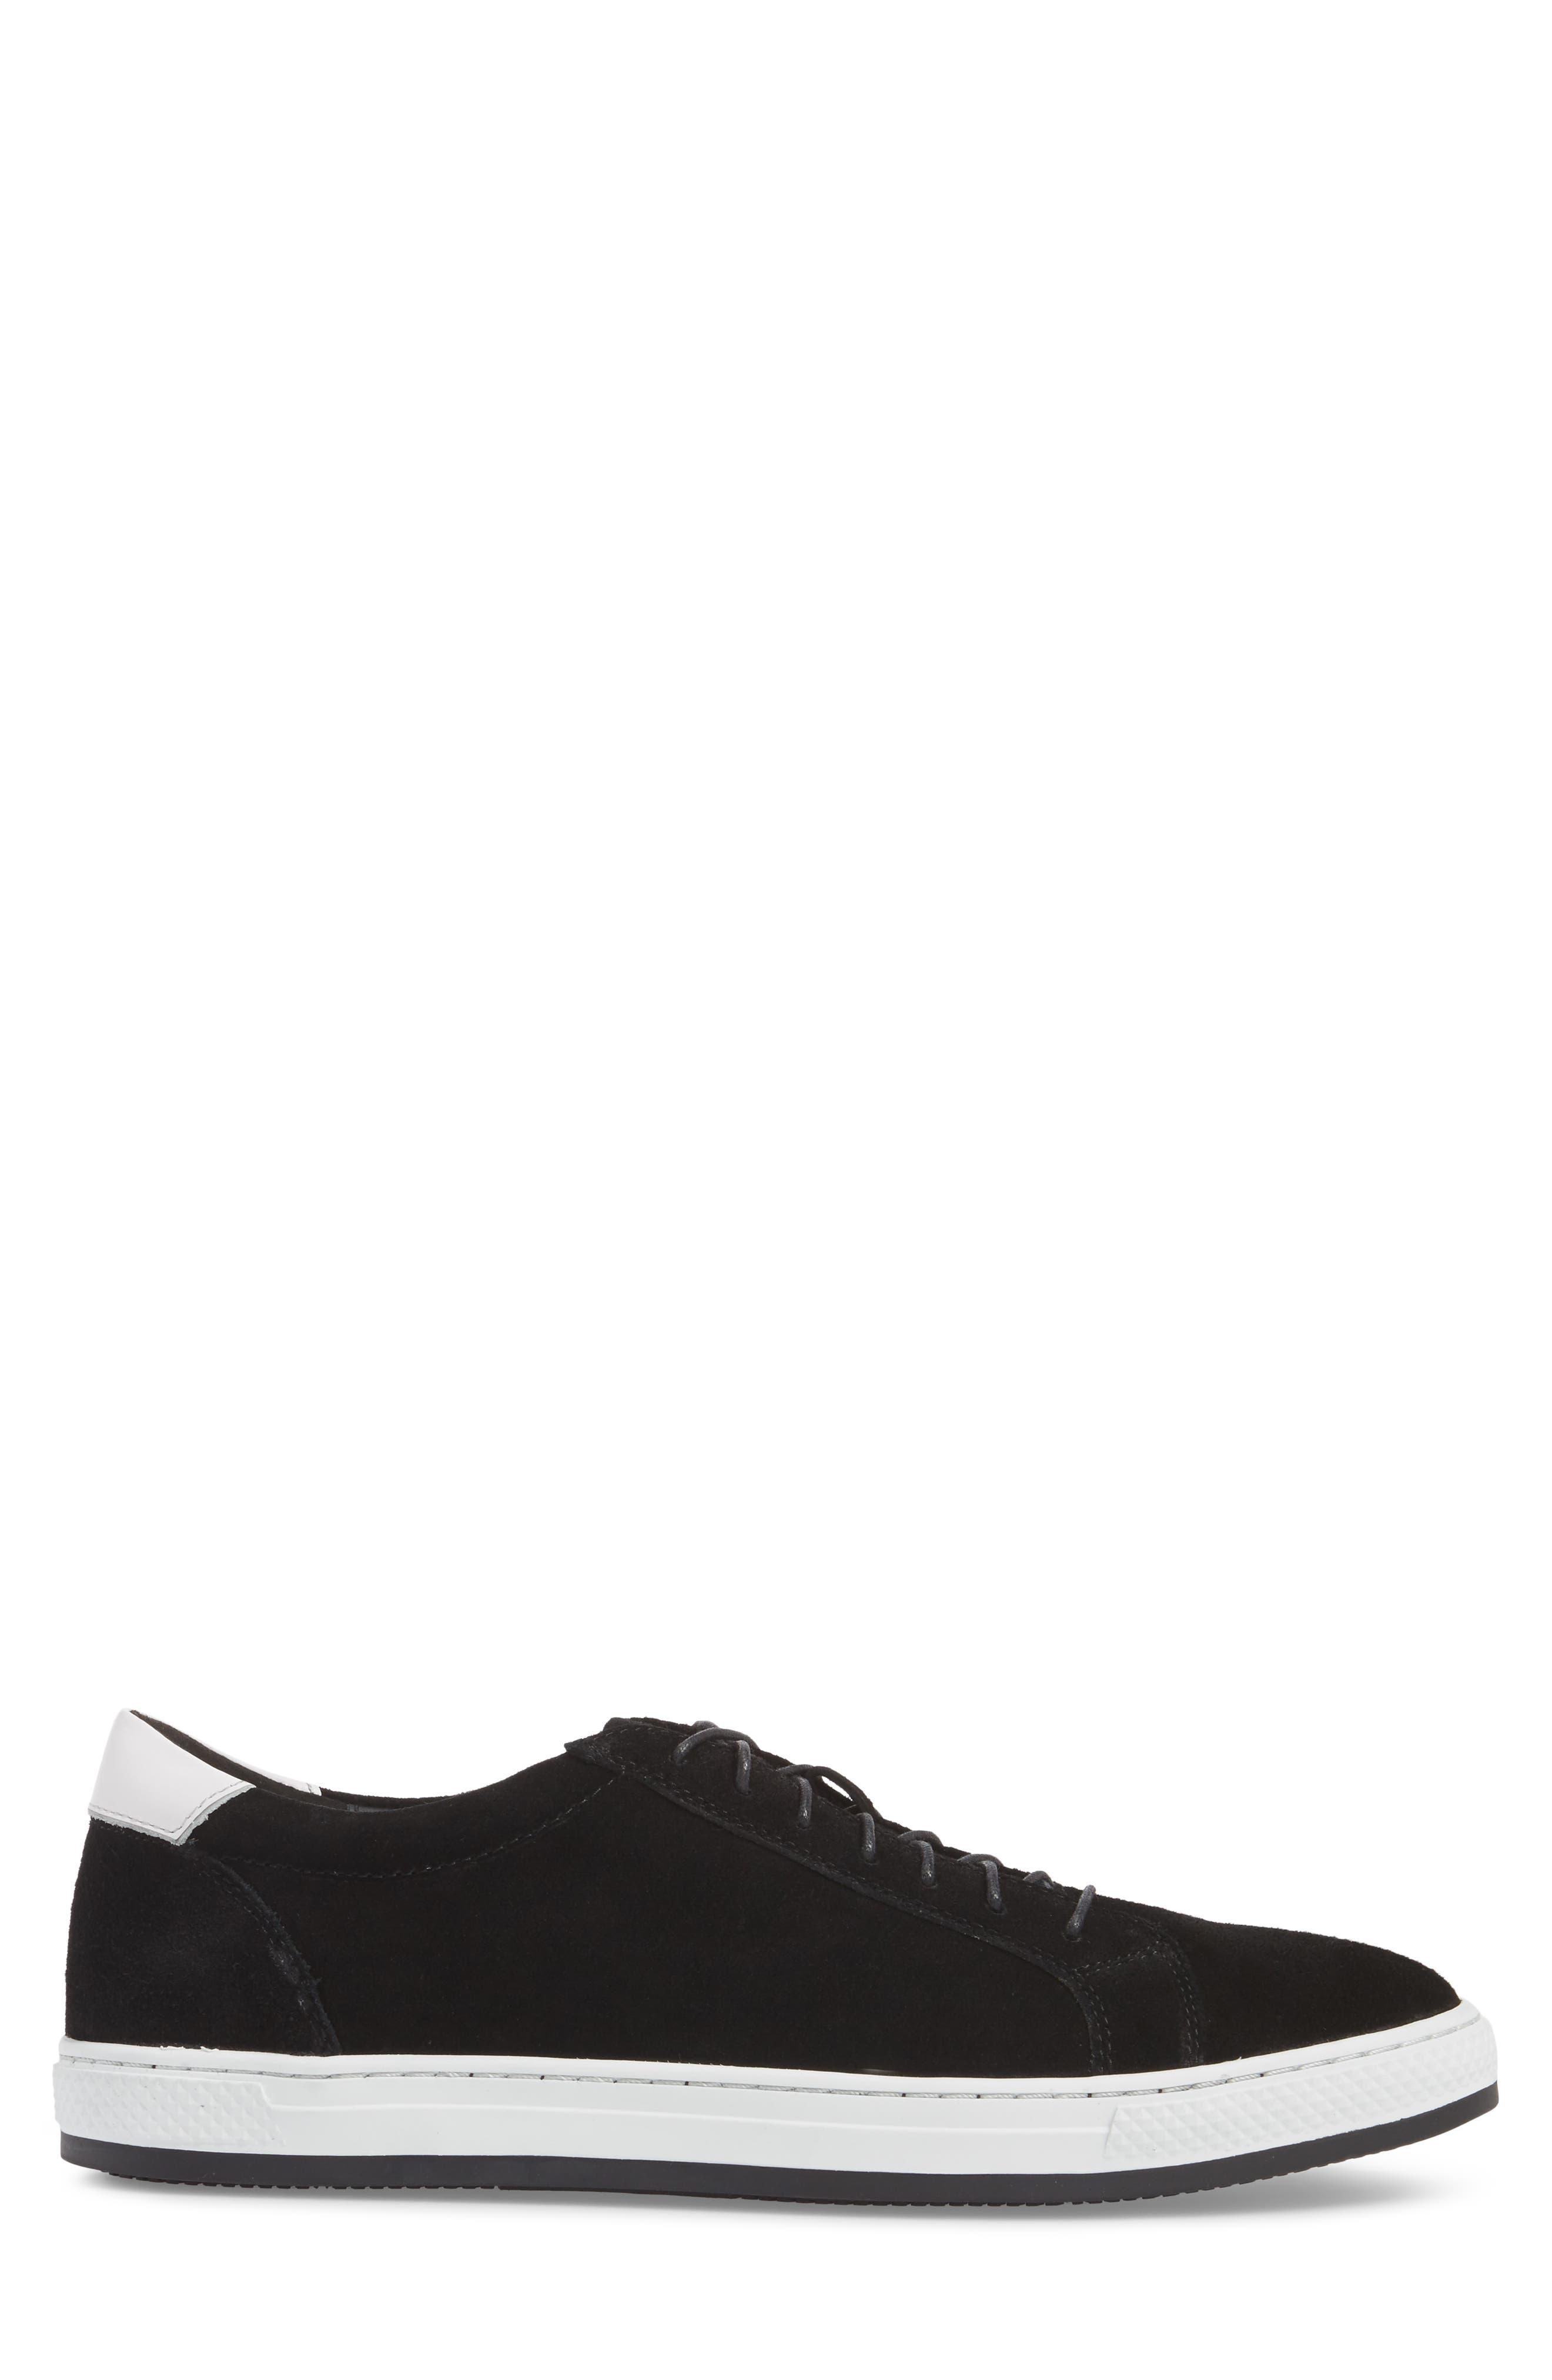 Queens Sneaker,                             Alternate thumbnail 3, color,                             Black Suede